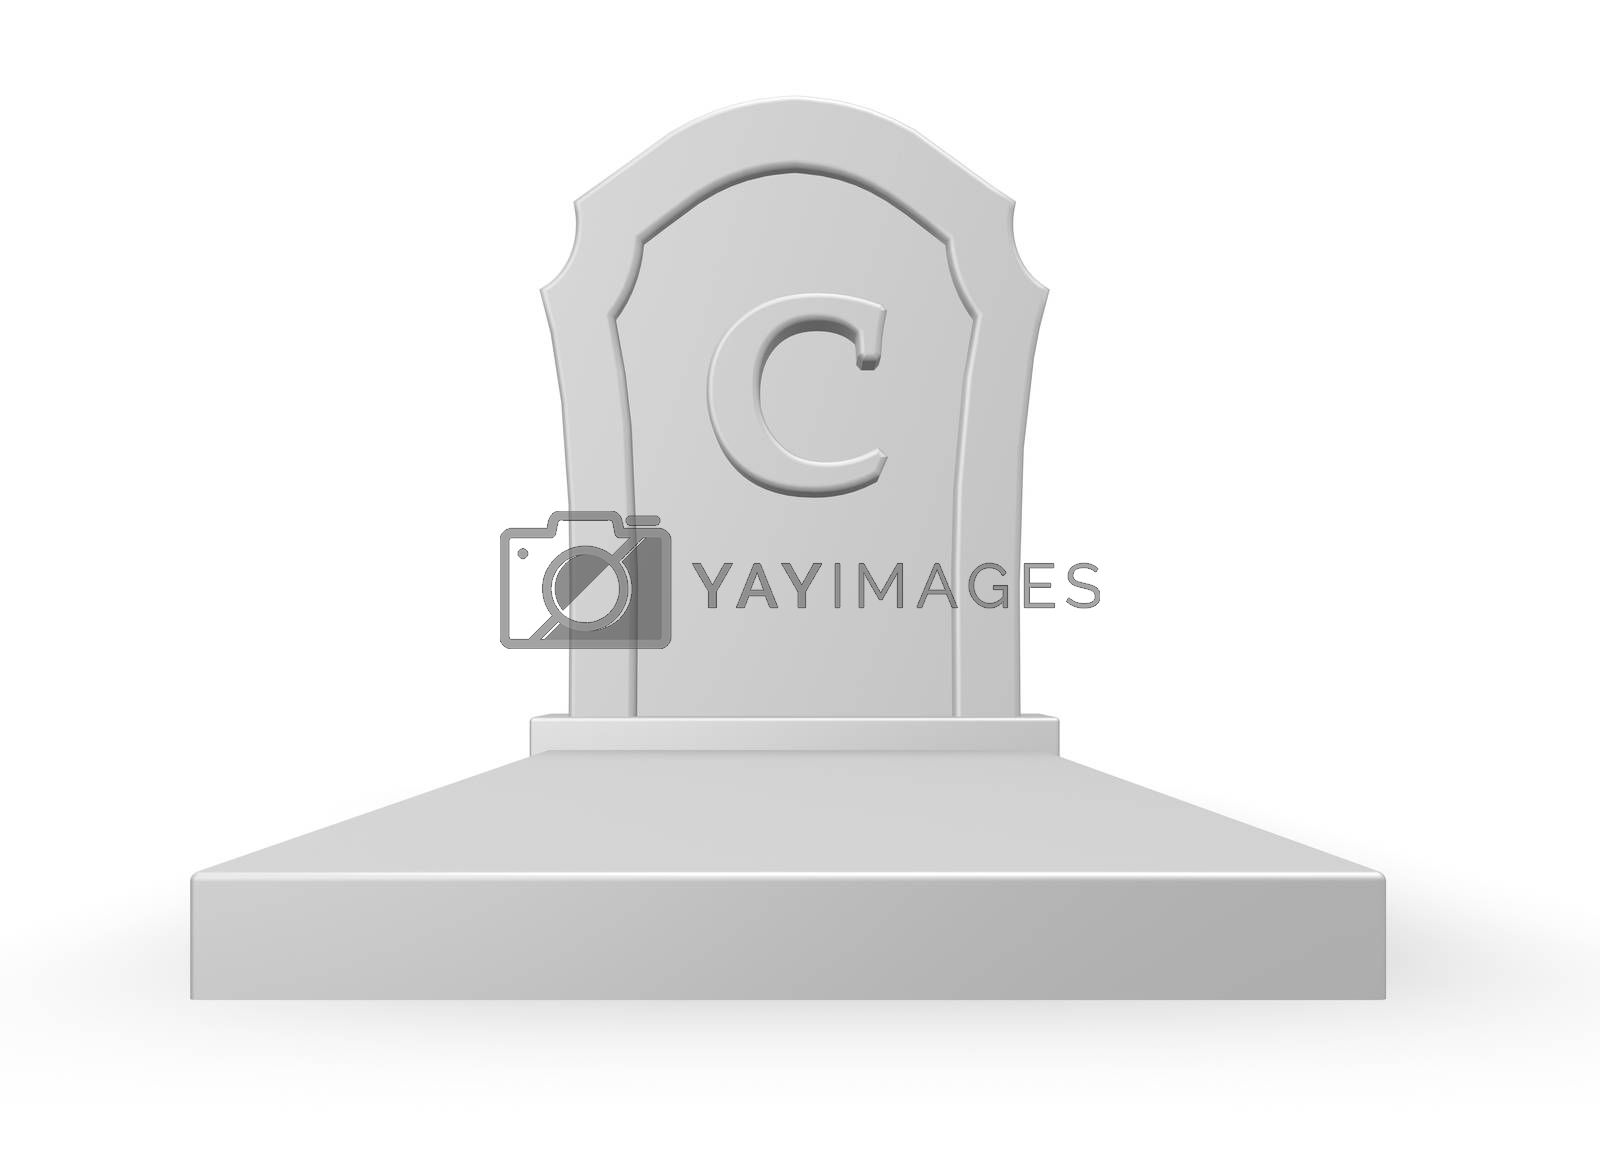 gravestone with uppercase letter c on white background - 3d illustration